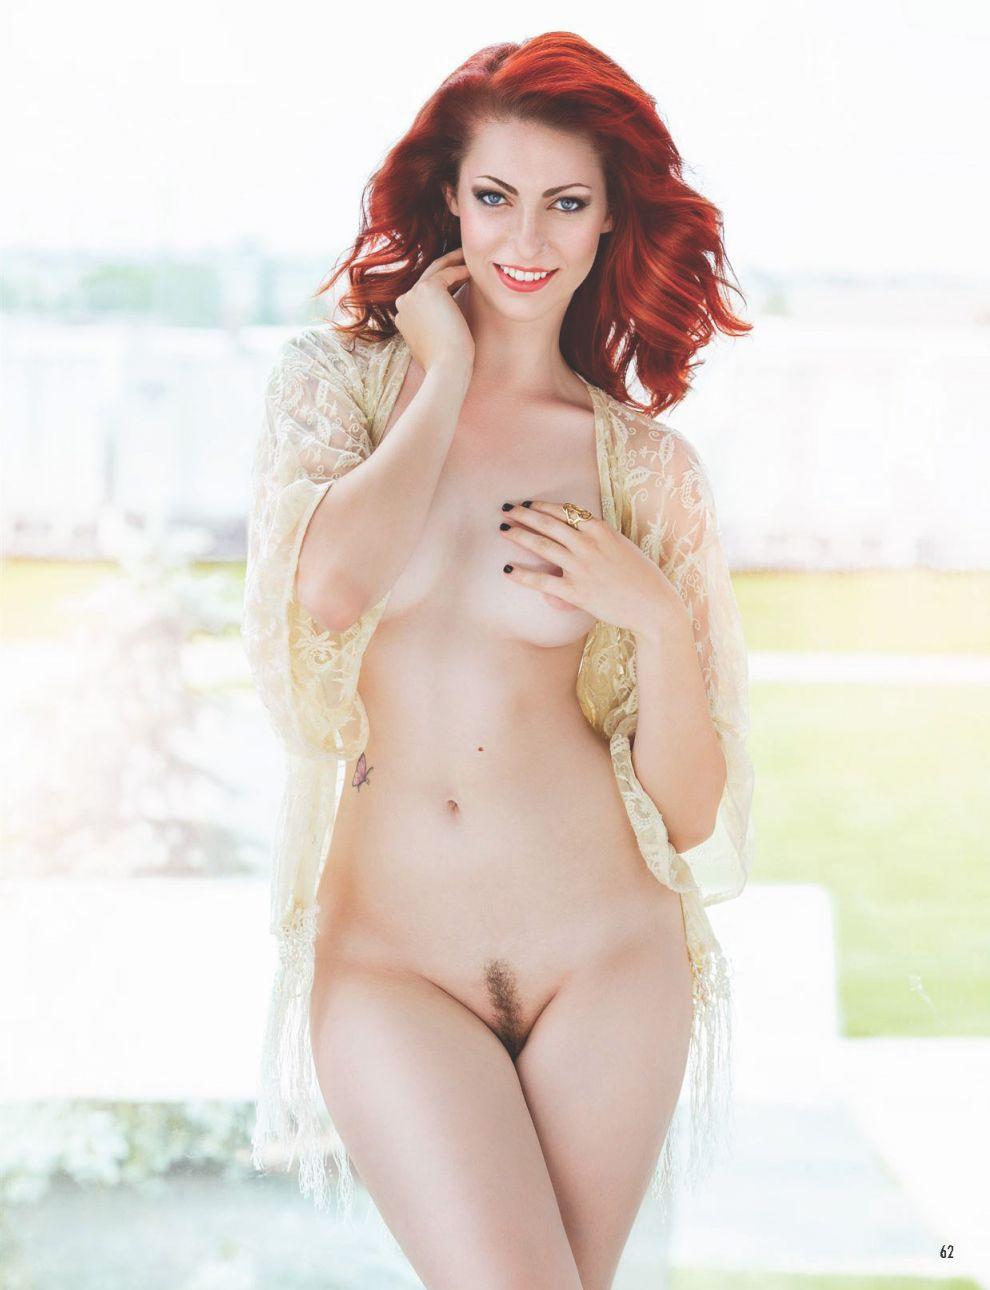 Arielita Sexy Nude Photoshoot (3)